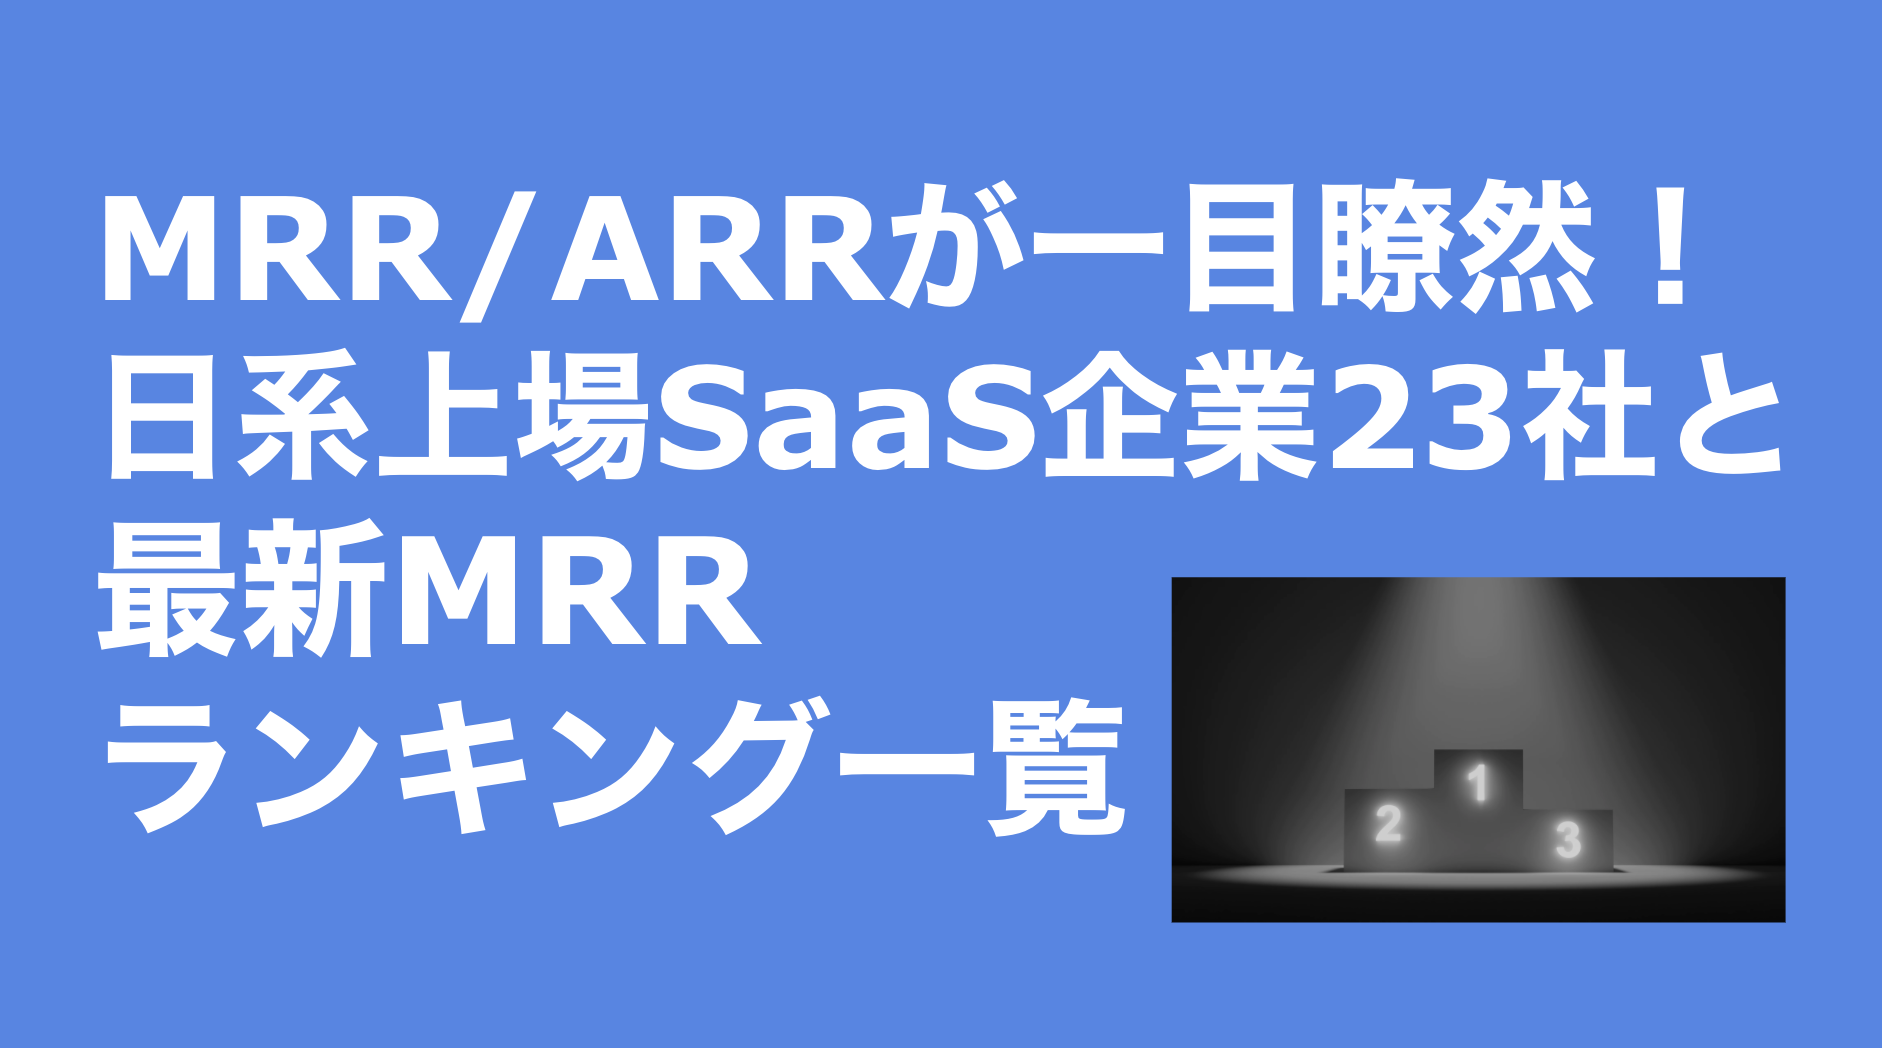 saaslife_MRR/ARRが一目瞭然!日系上場SaaS企業23社とその最新MRRとARRランキング一覧